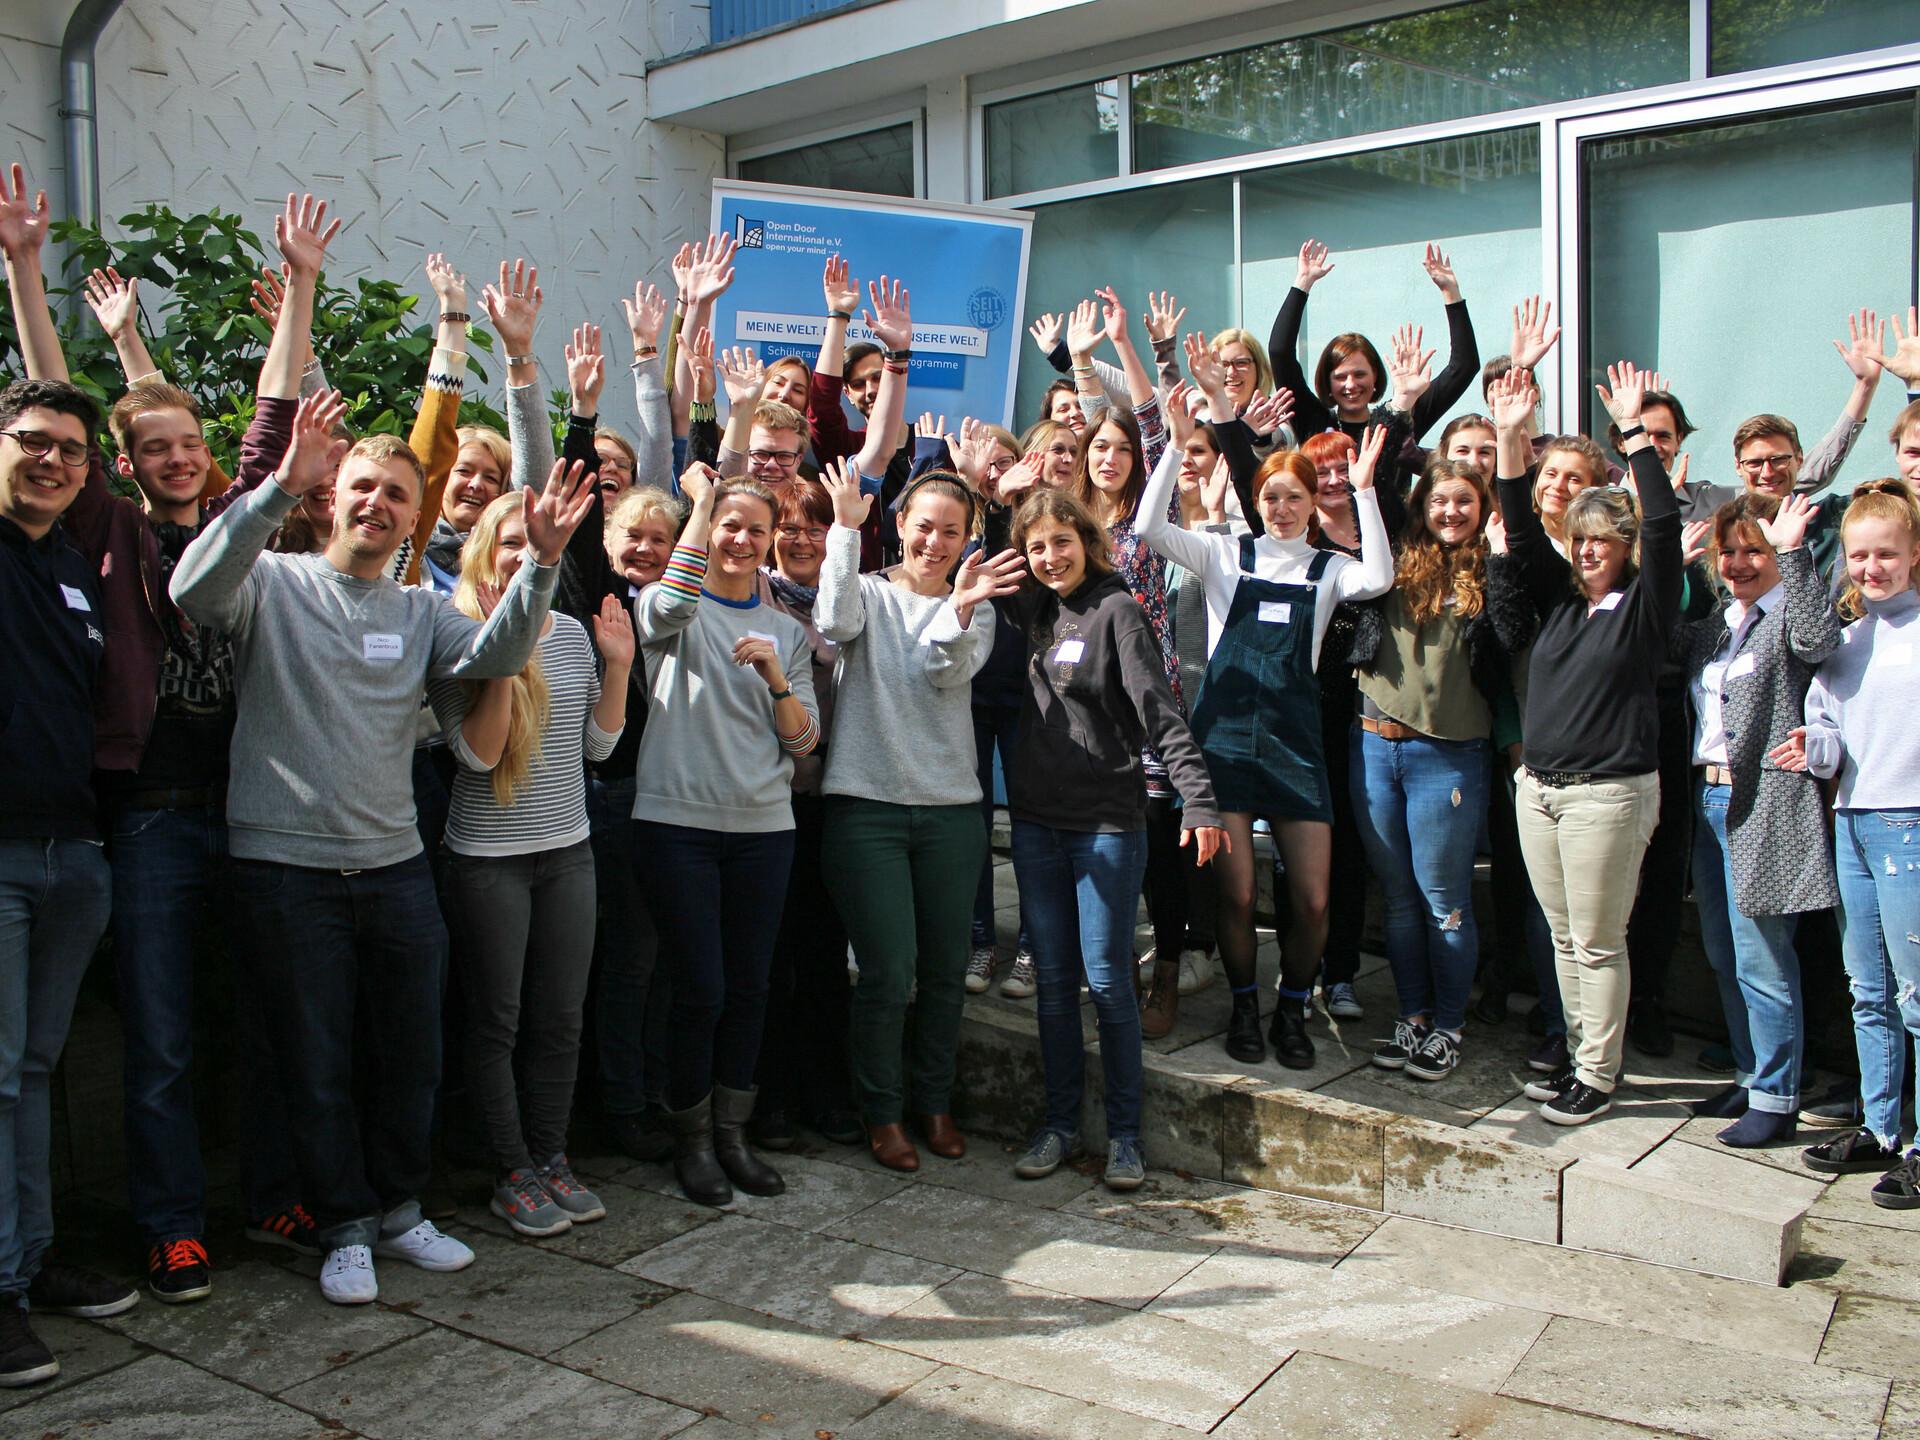 Schüleraustausch Lehrerinfos Schule als Gastgeber Unterstützung